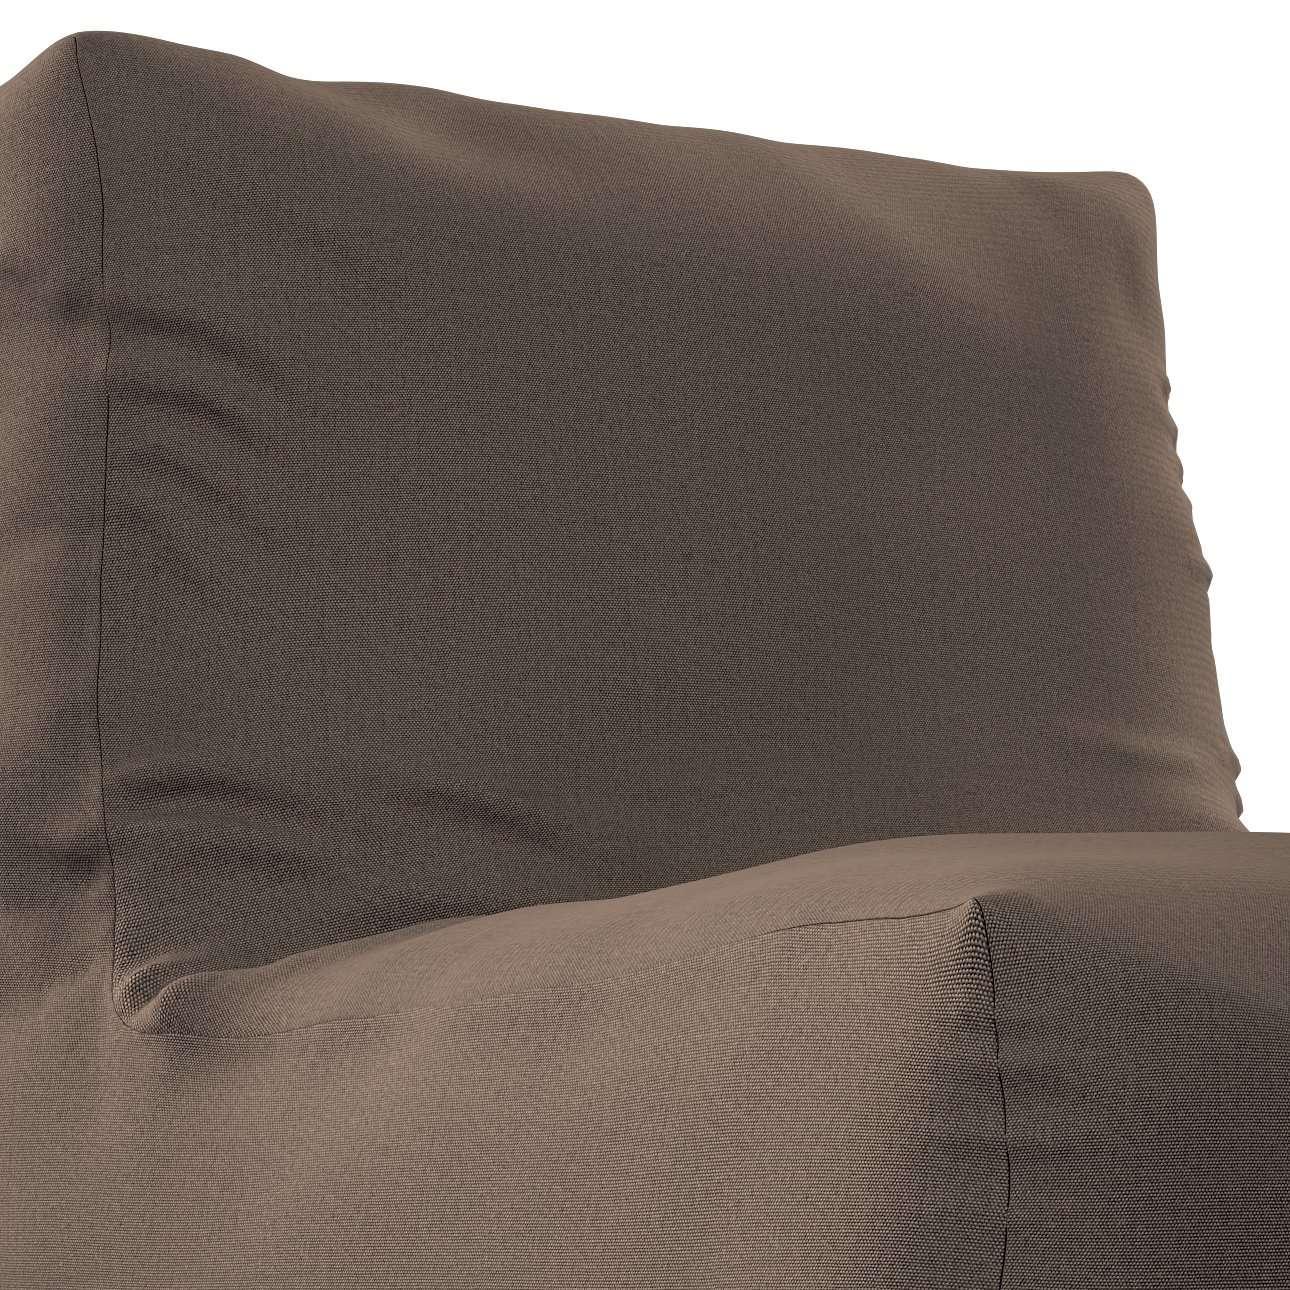 Pufa- fotel w kolekcji Etna, tkanina: 705-08